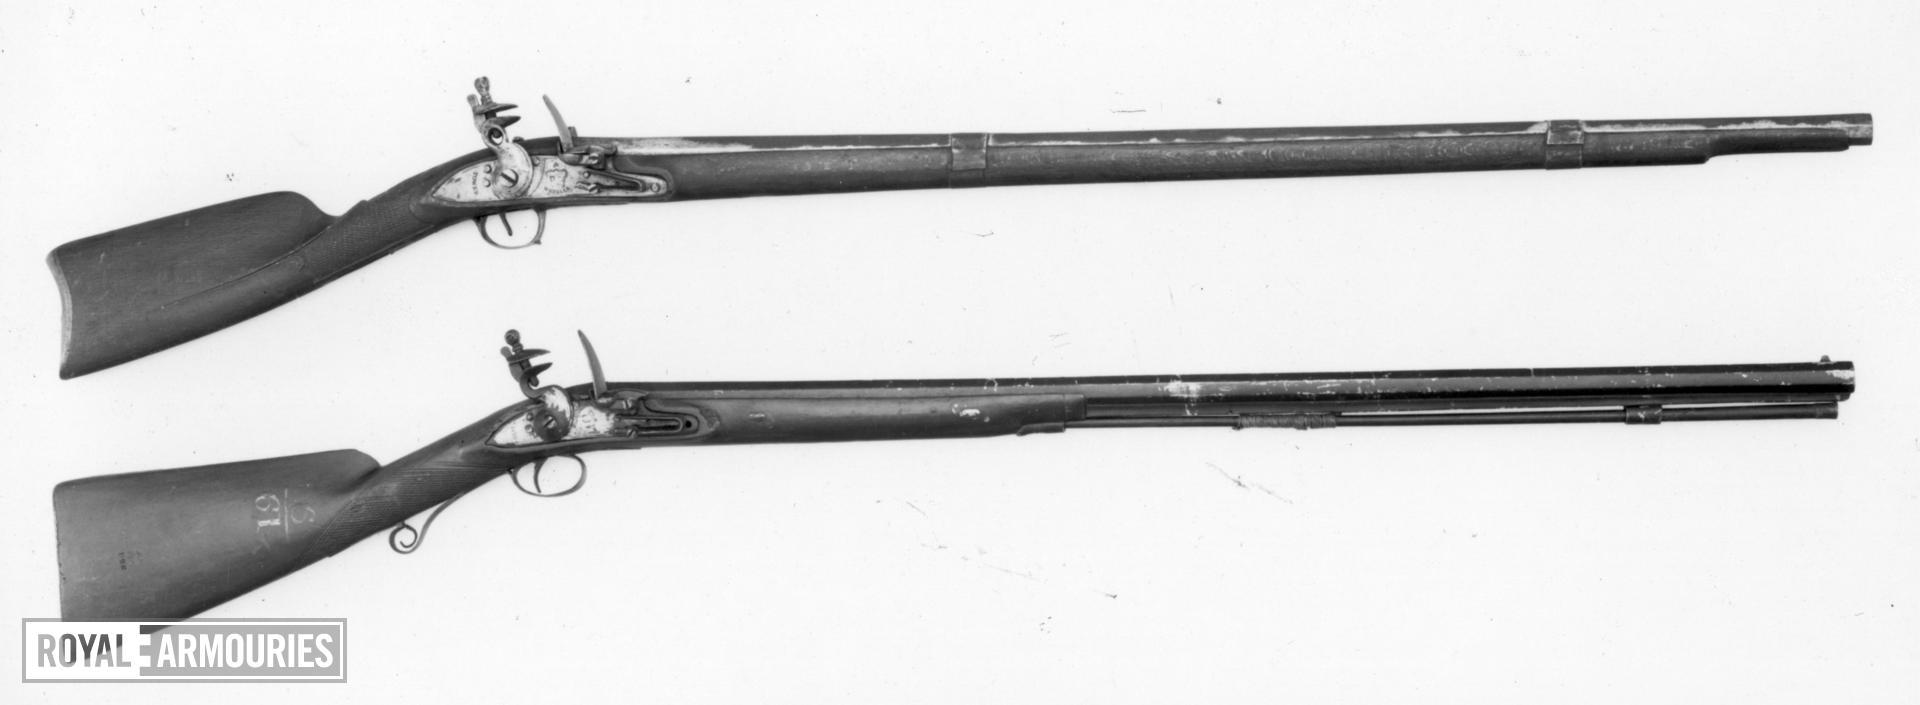 Flintlock gun Standard East India Company carbine lock Steel, Baker's improved pattern